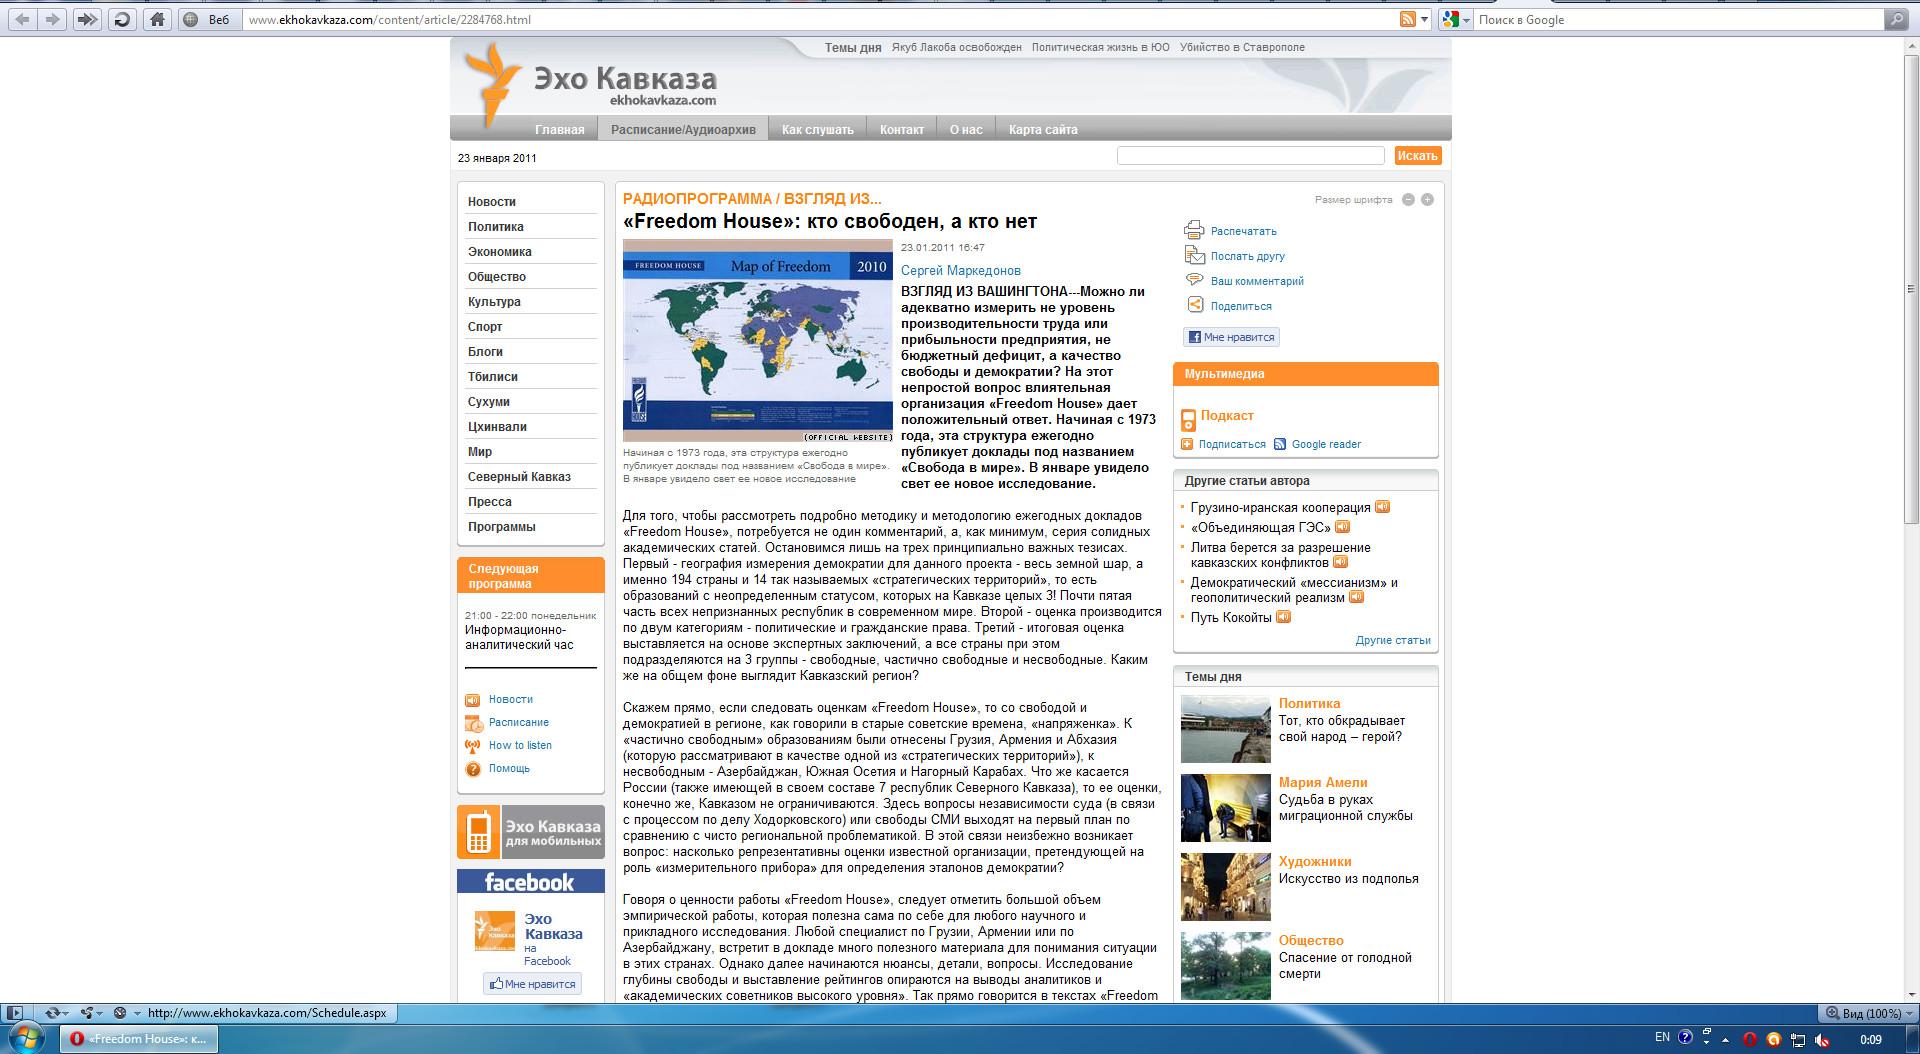 http://img-fotki.yandex.ru/get/4402/datka2.0/0_63d45_16f21b91_orig